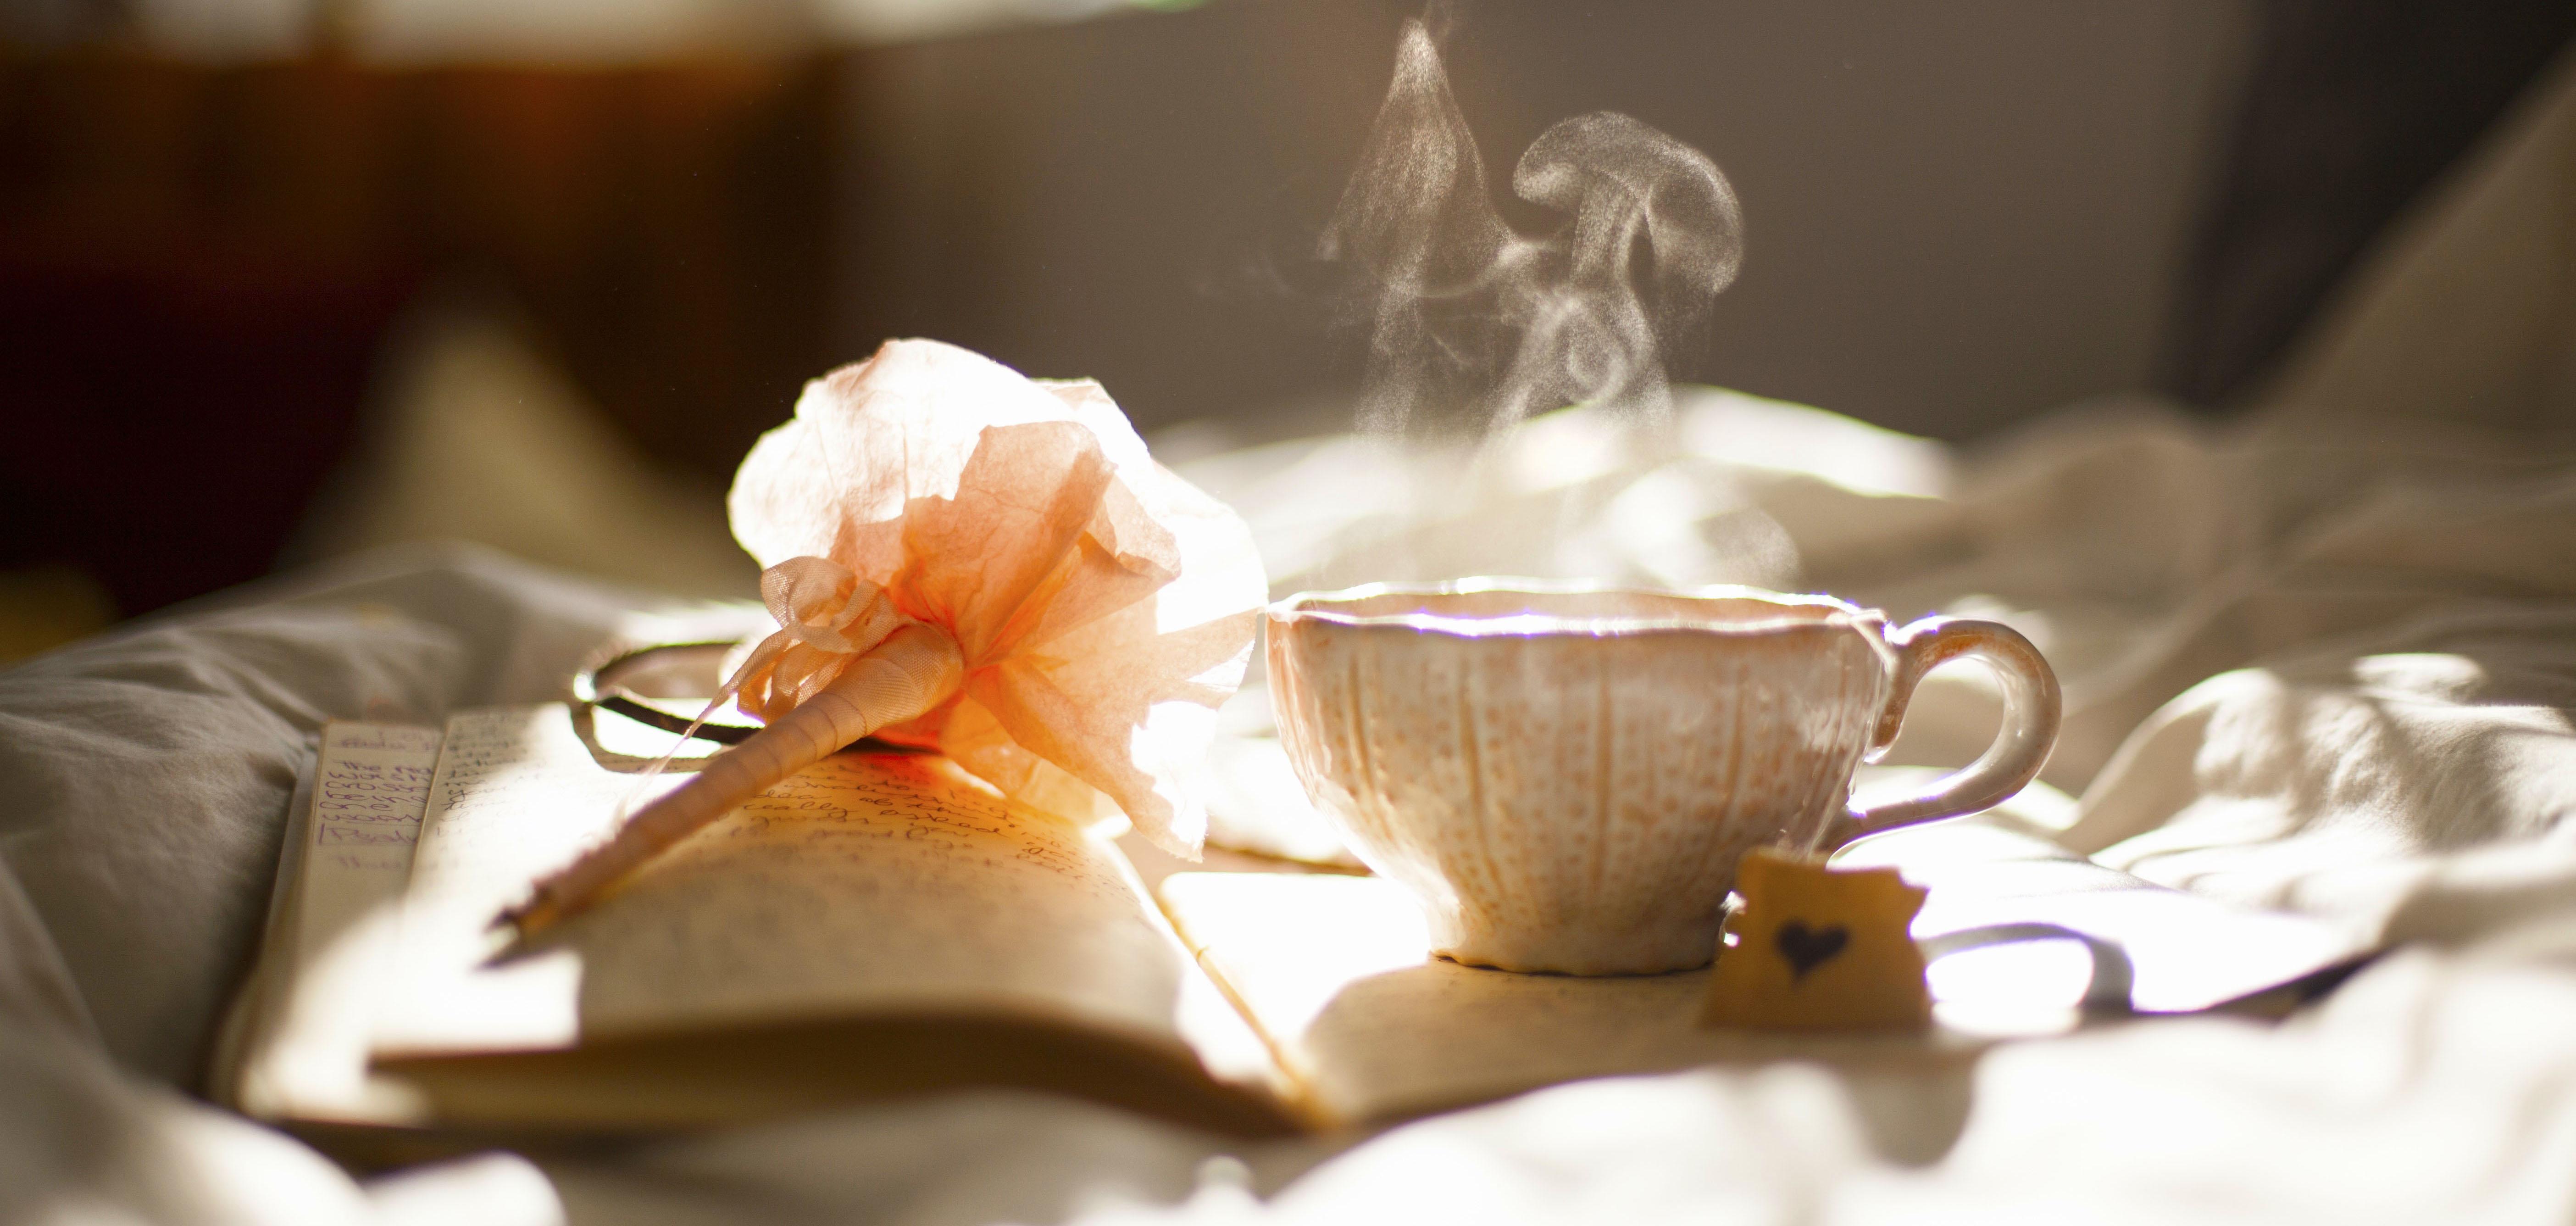 QoR8Bv1S2SEqH6UcSJCA_Tea - 3